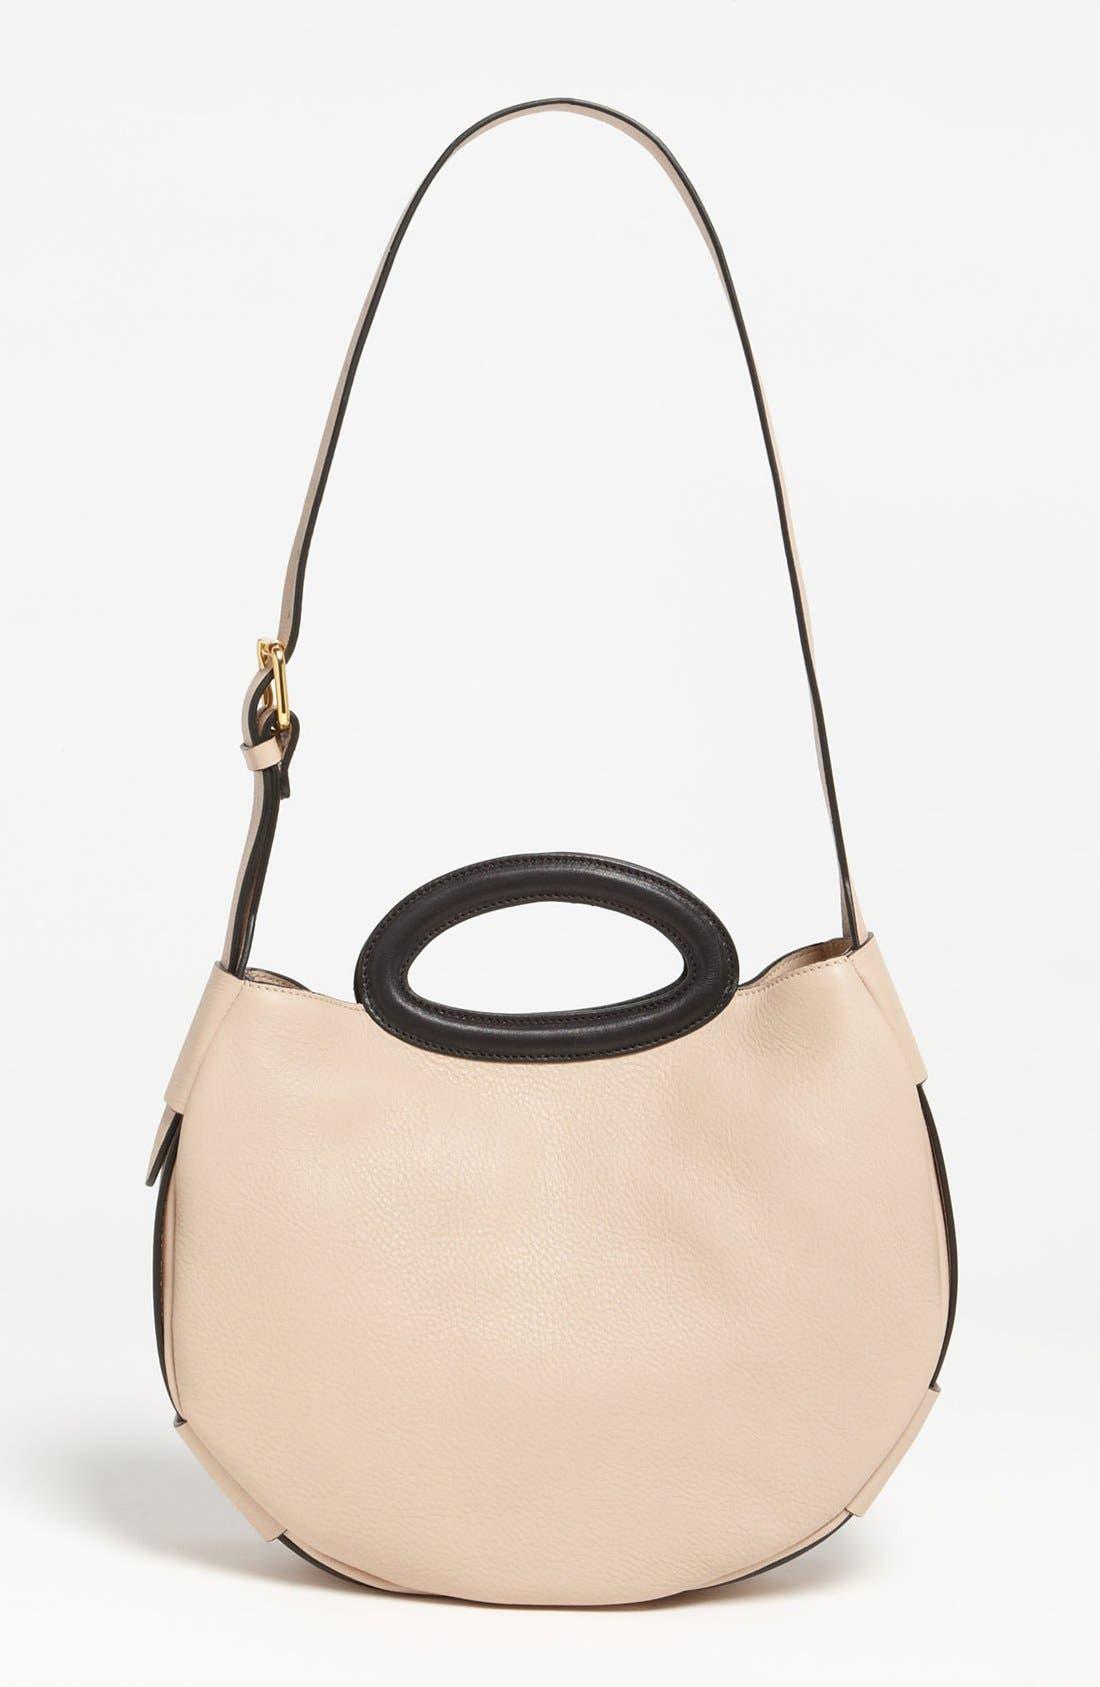 Alternate Image 1 Selected - Marni 'Balloon - Small' Shoulder Bag